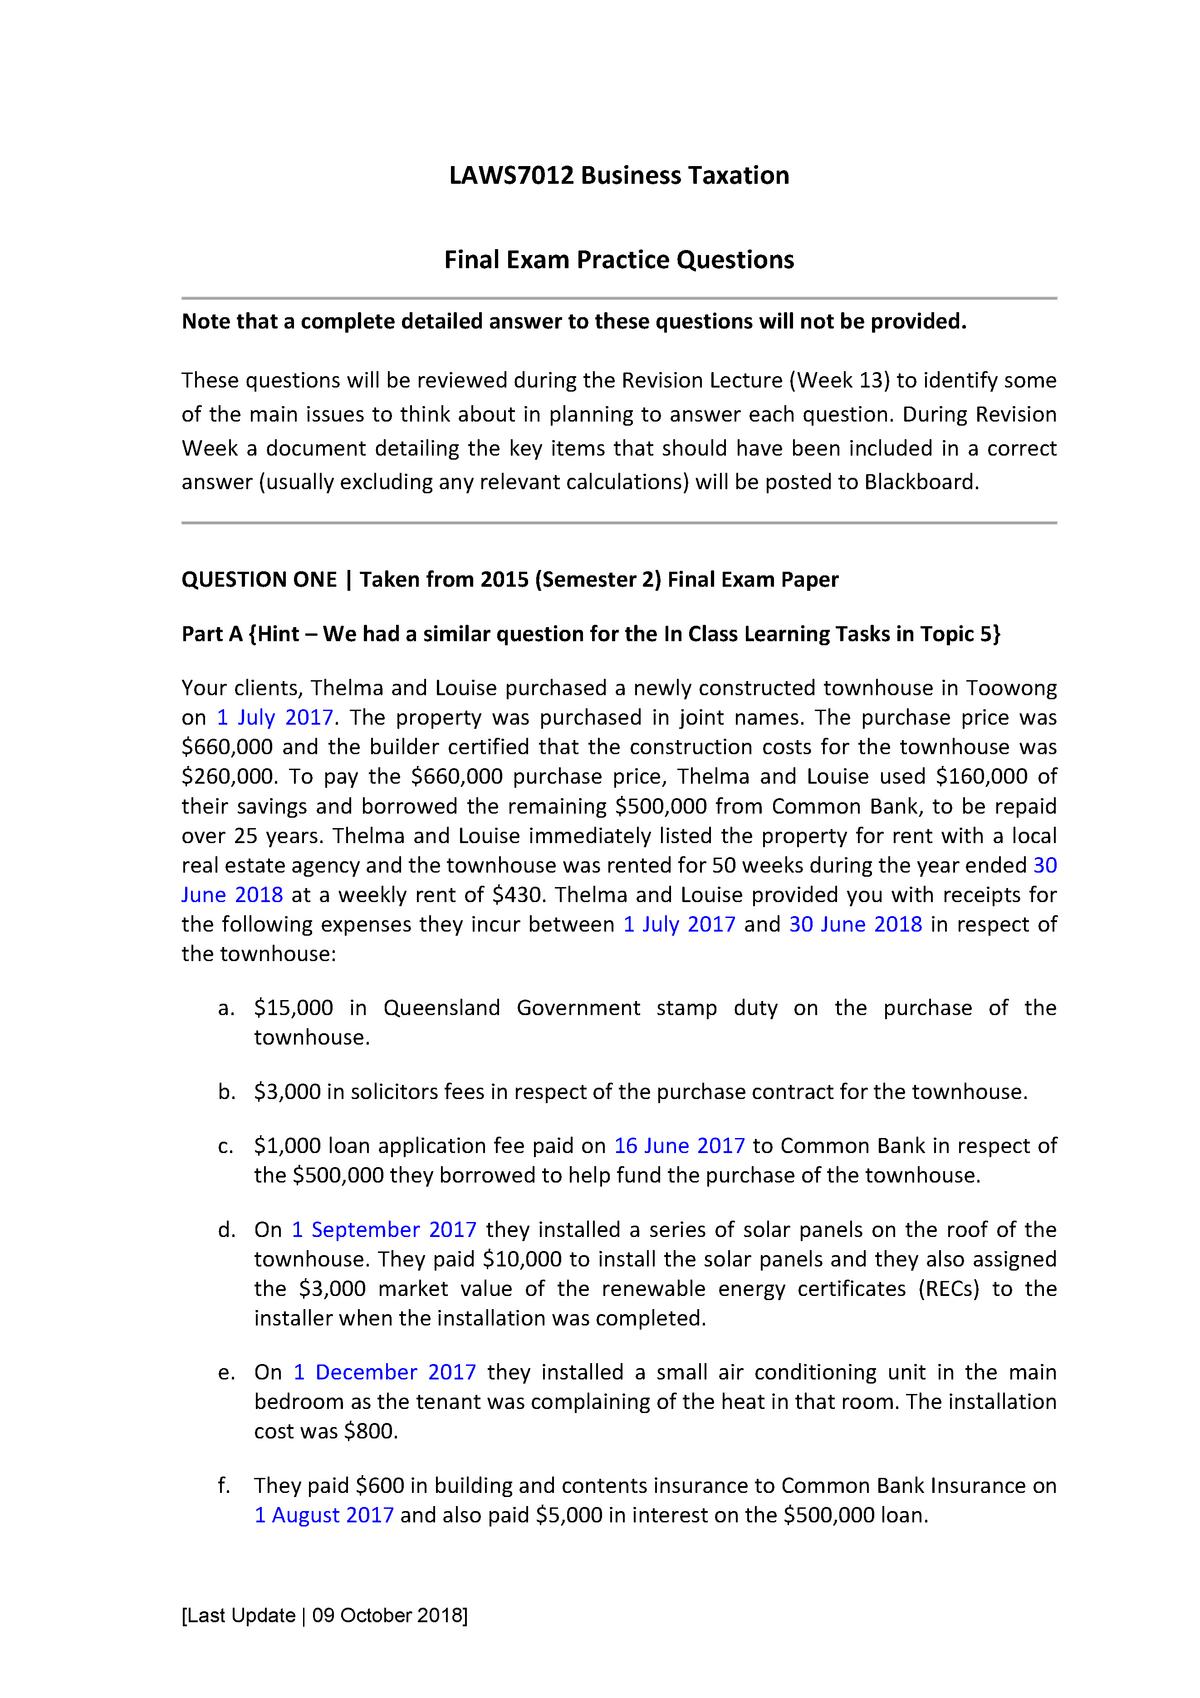 Exam 2018 - LAWS7012: Business Taxation - StuDocu